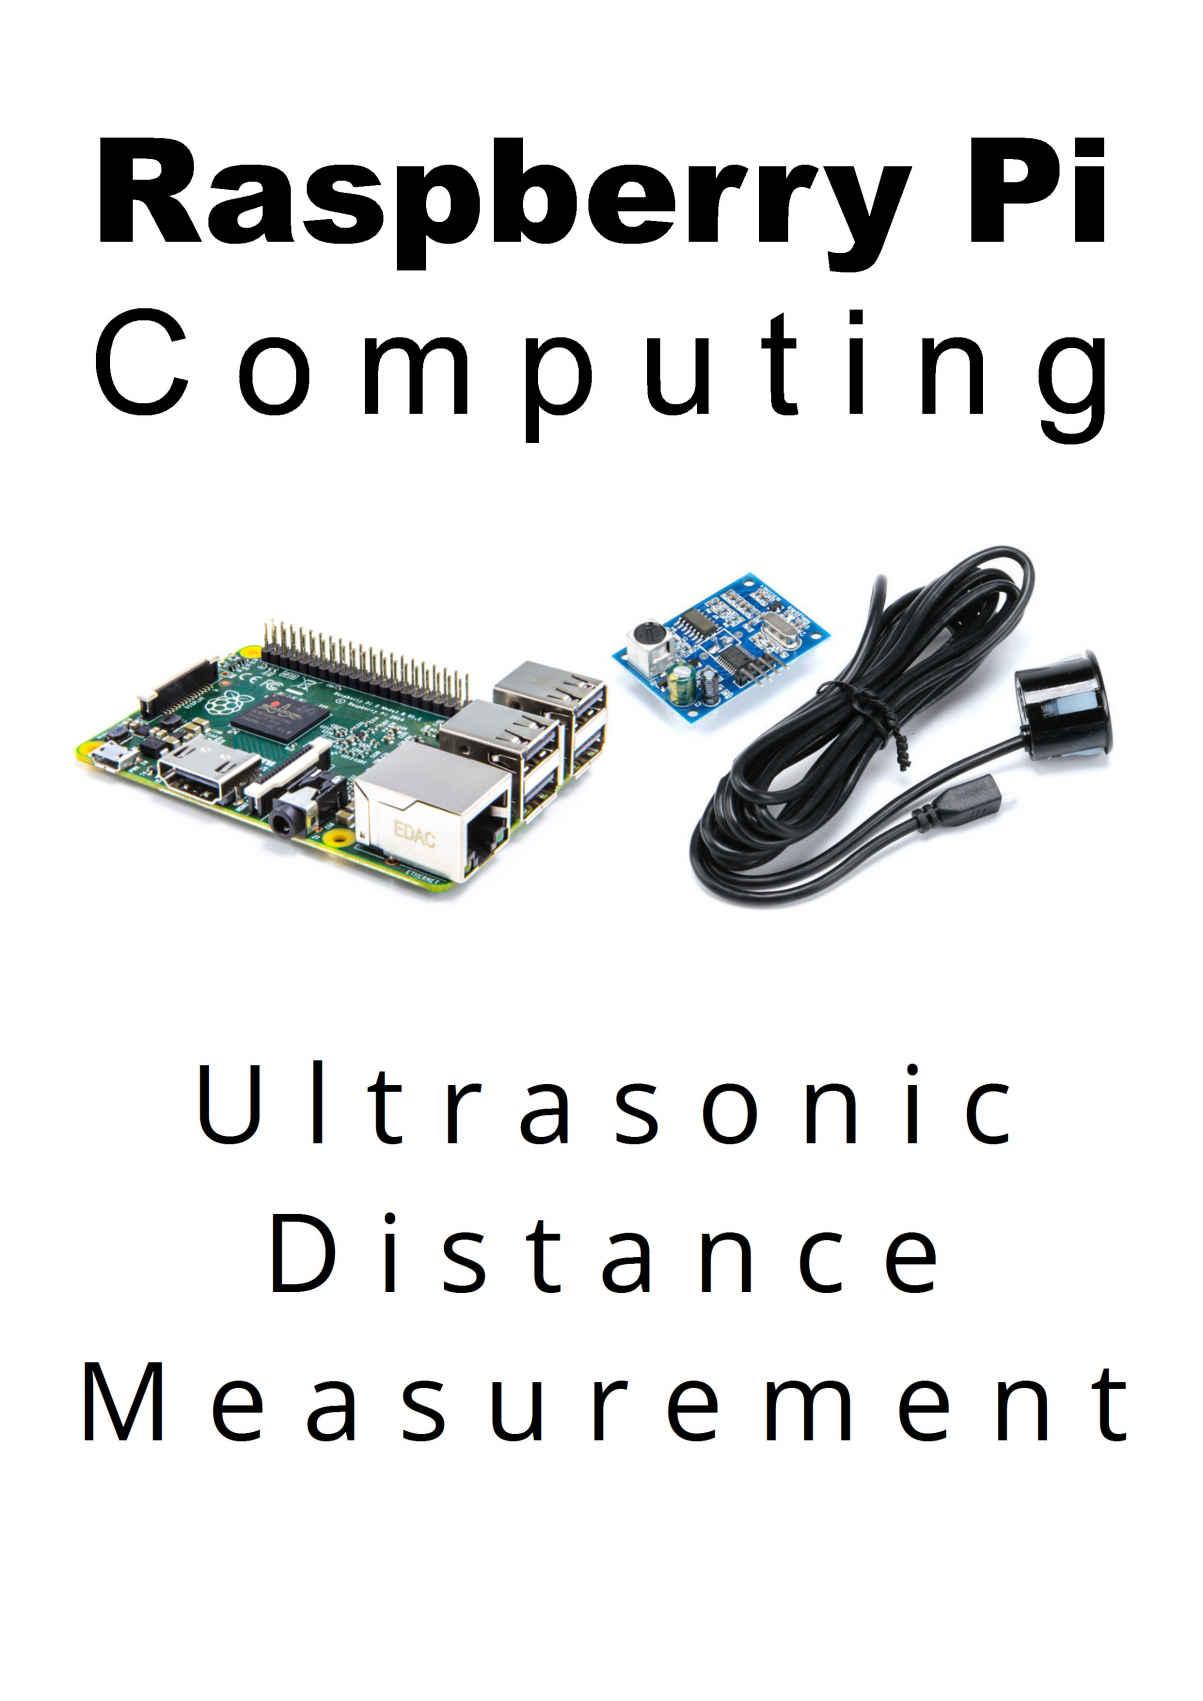 Raspberry Pi Computing: Ultrasonic Distance Measurement